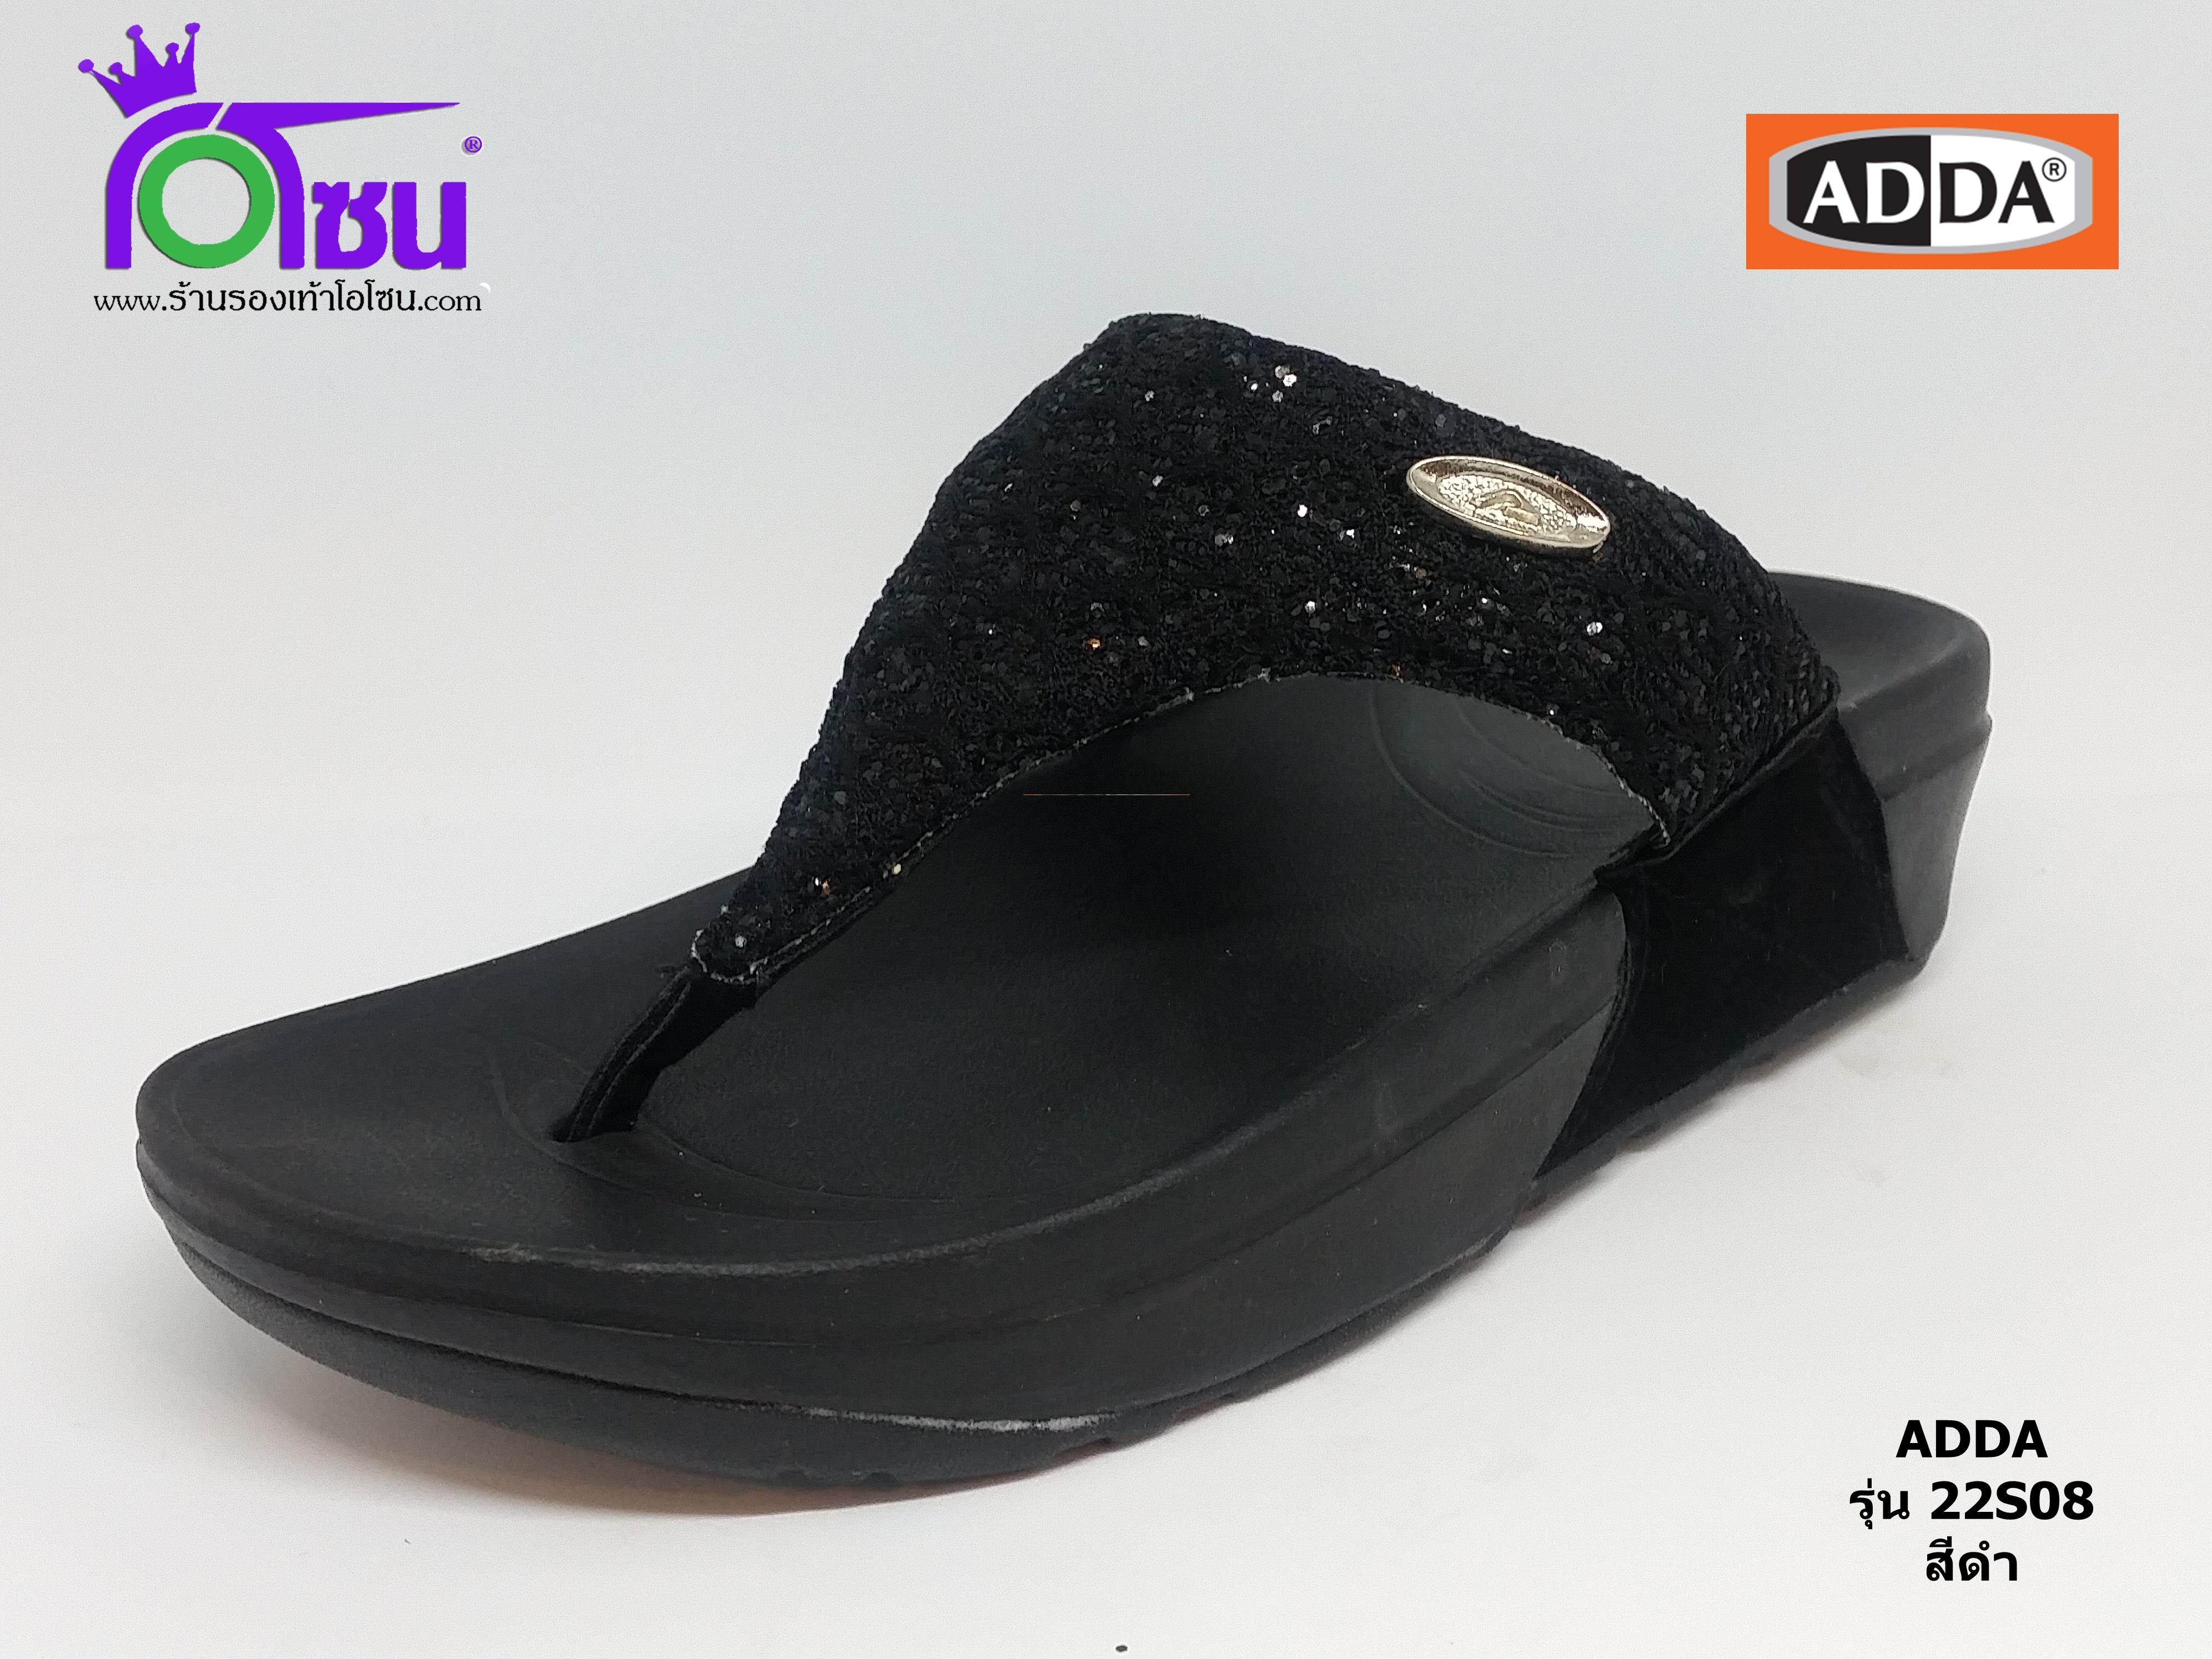 ADDA แอดด๊า รหัส 22S08 สีดำ เบอร์ 4-7